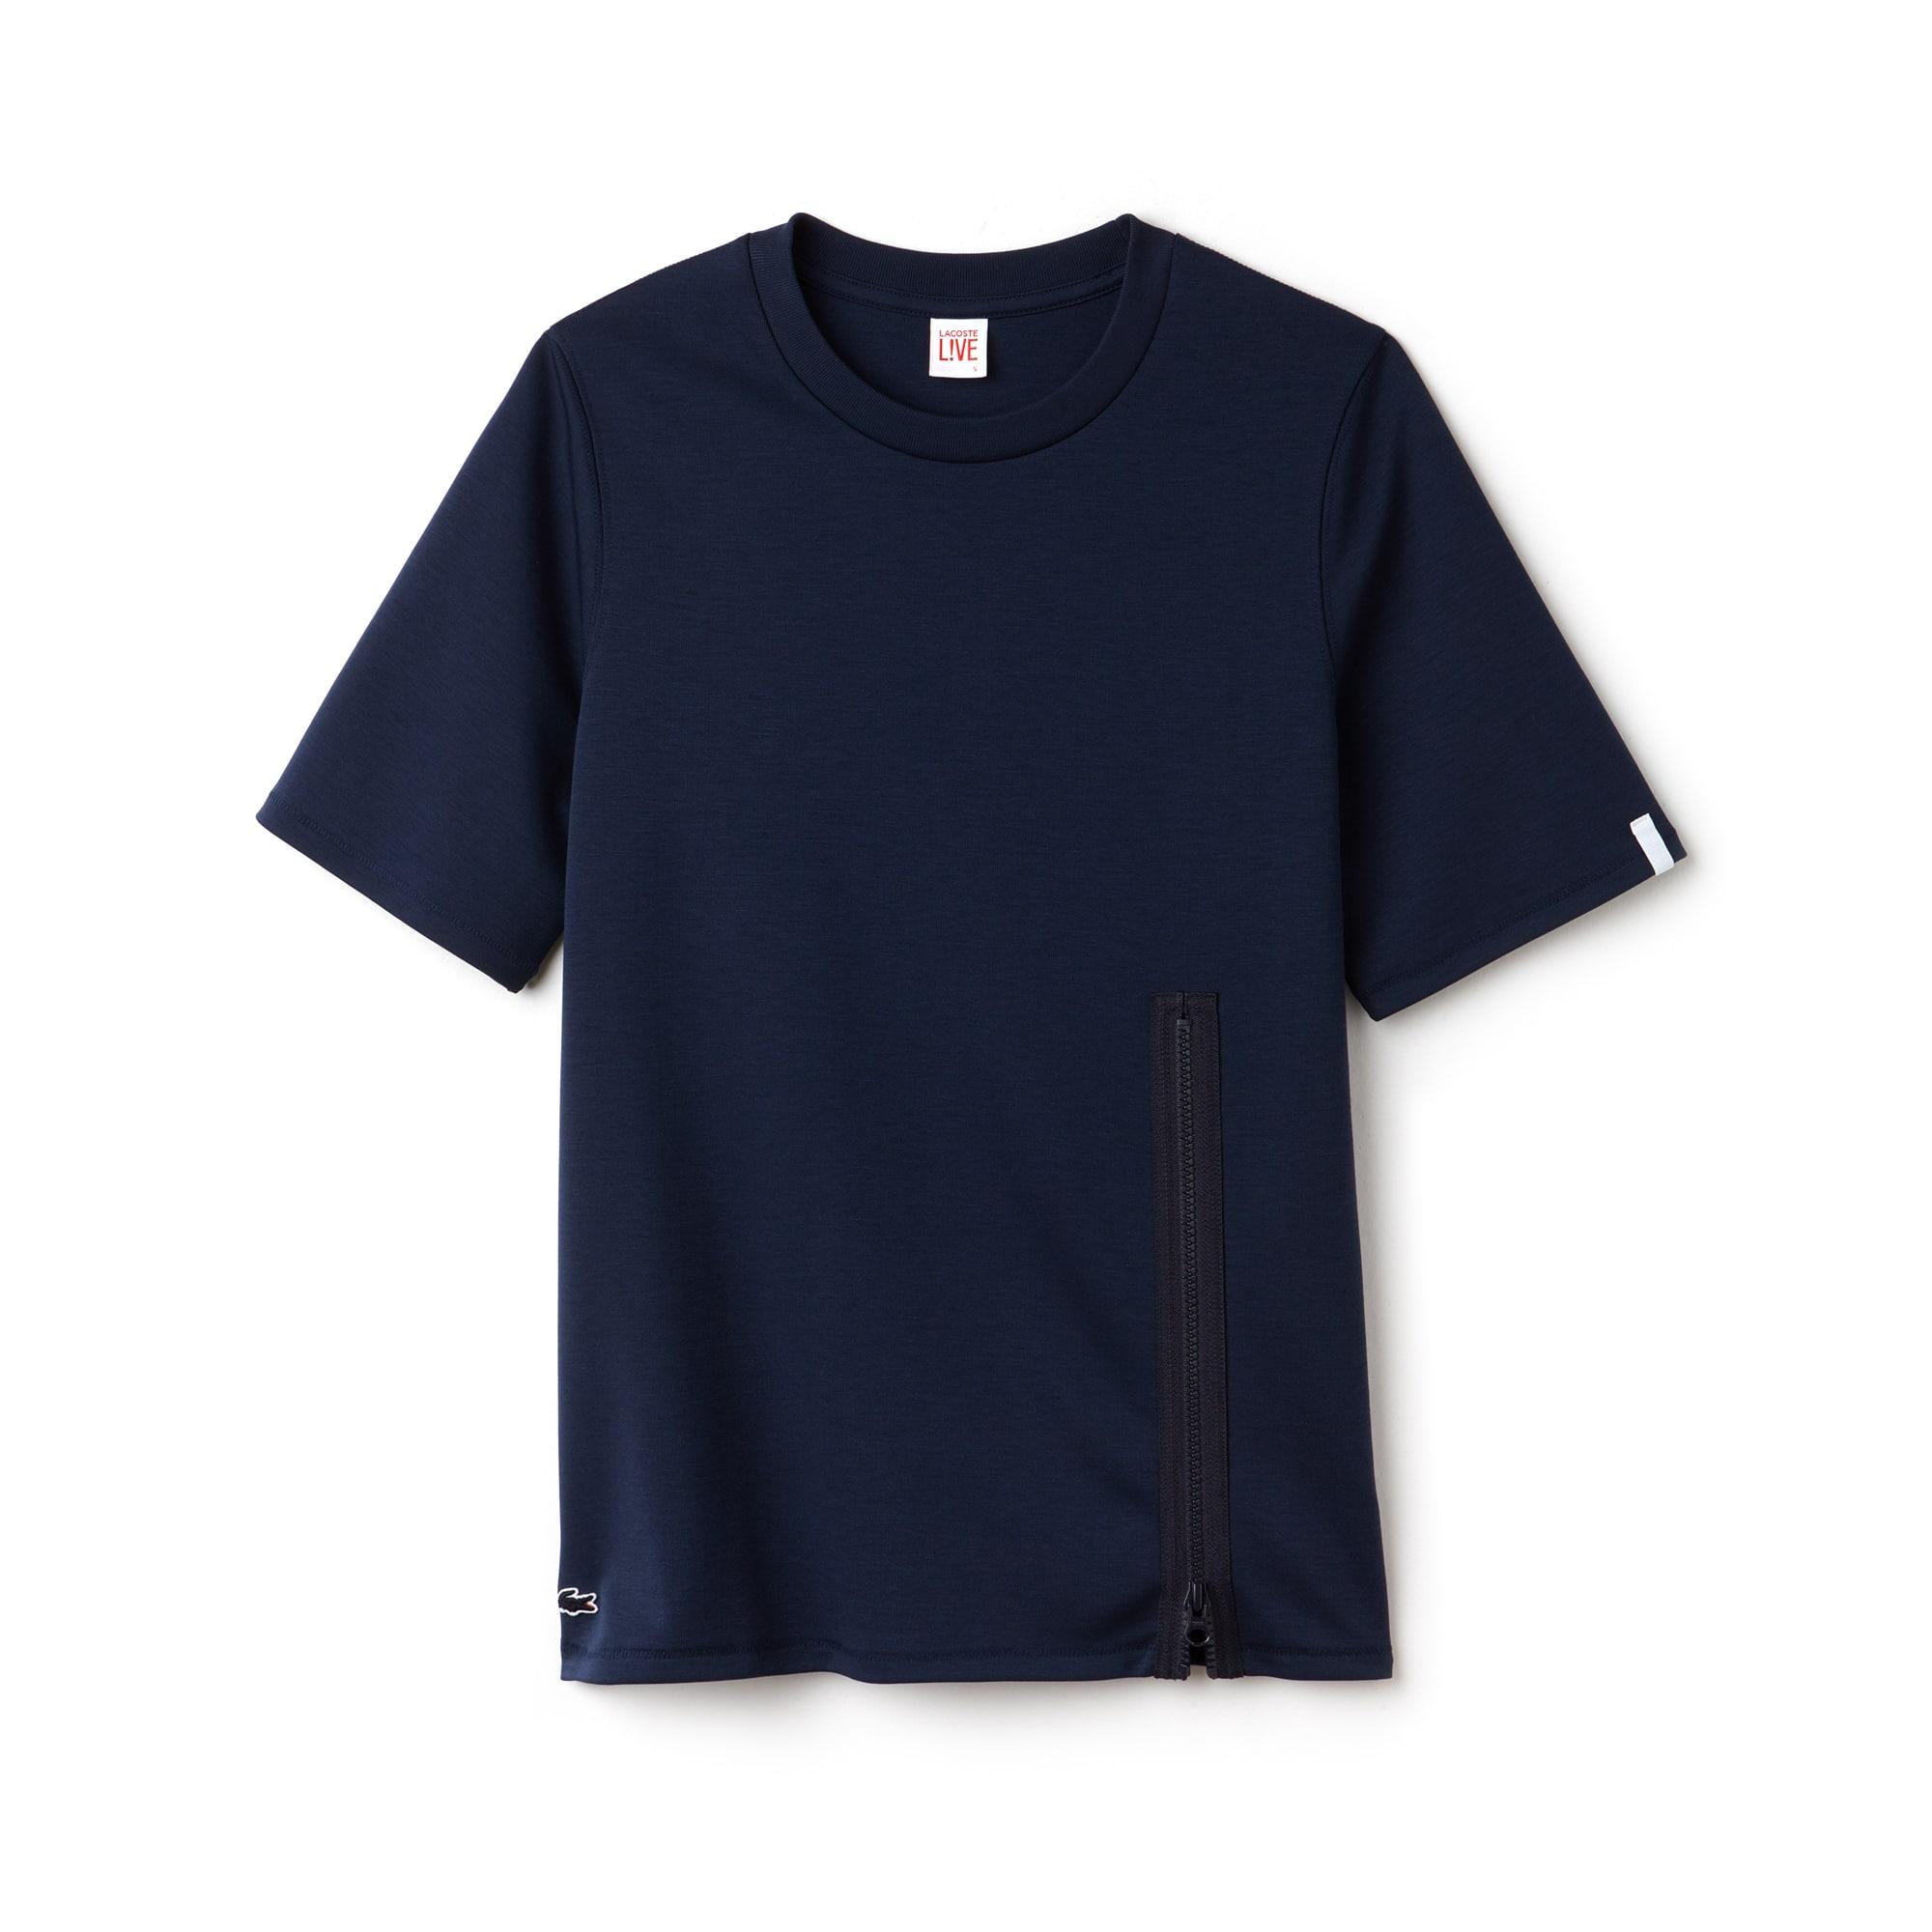 T-shirt a girocollo Lacoste LIVE in jersey dotata di chiusura con zip